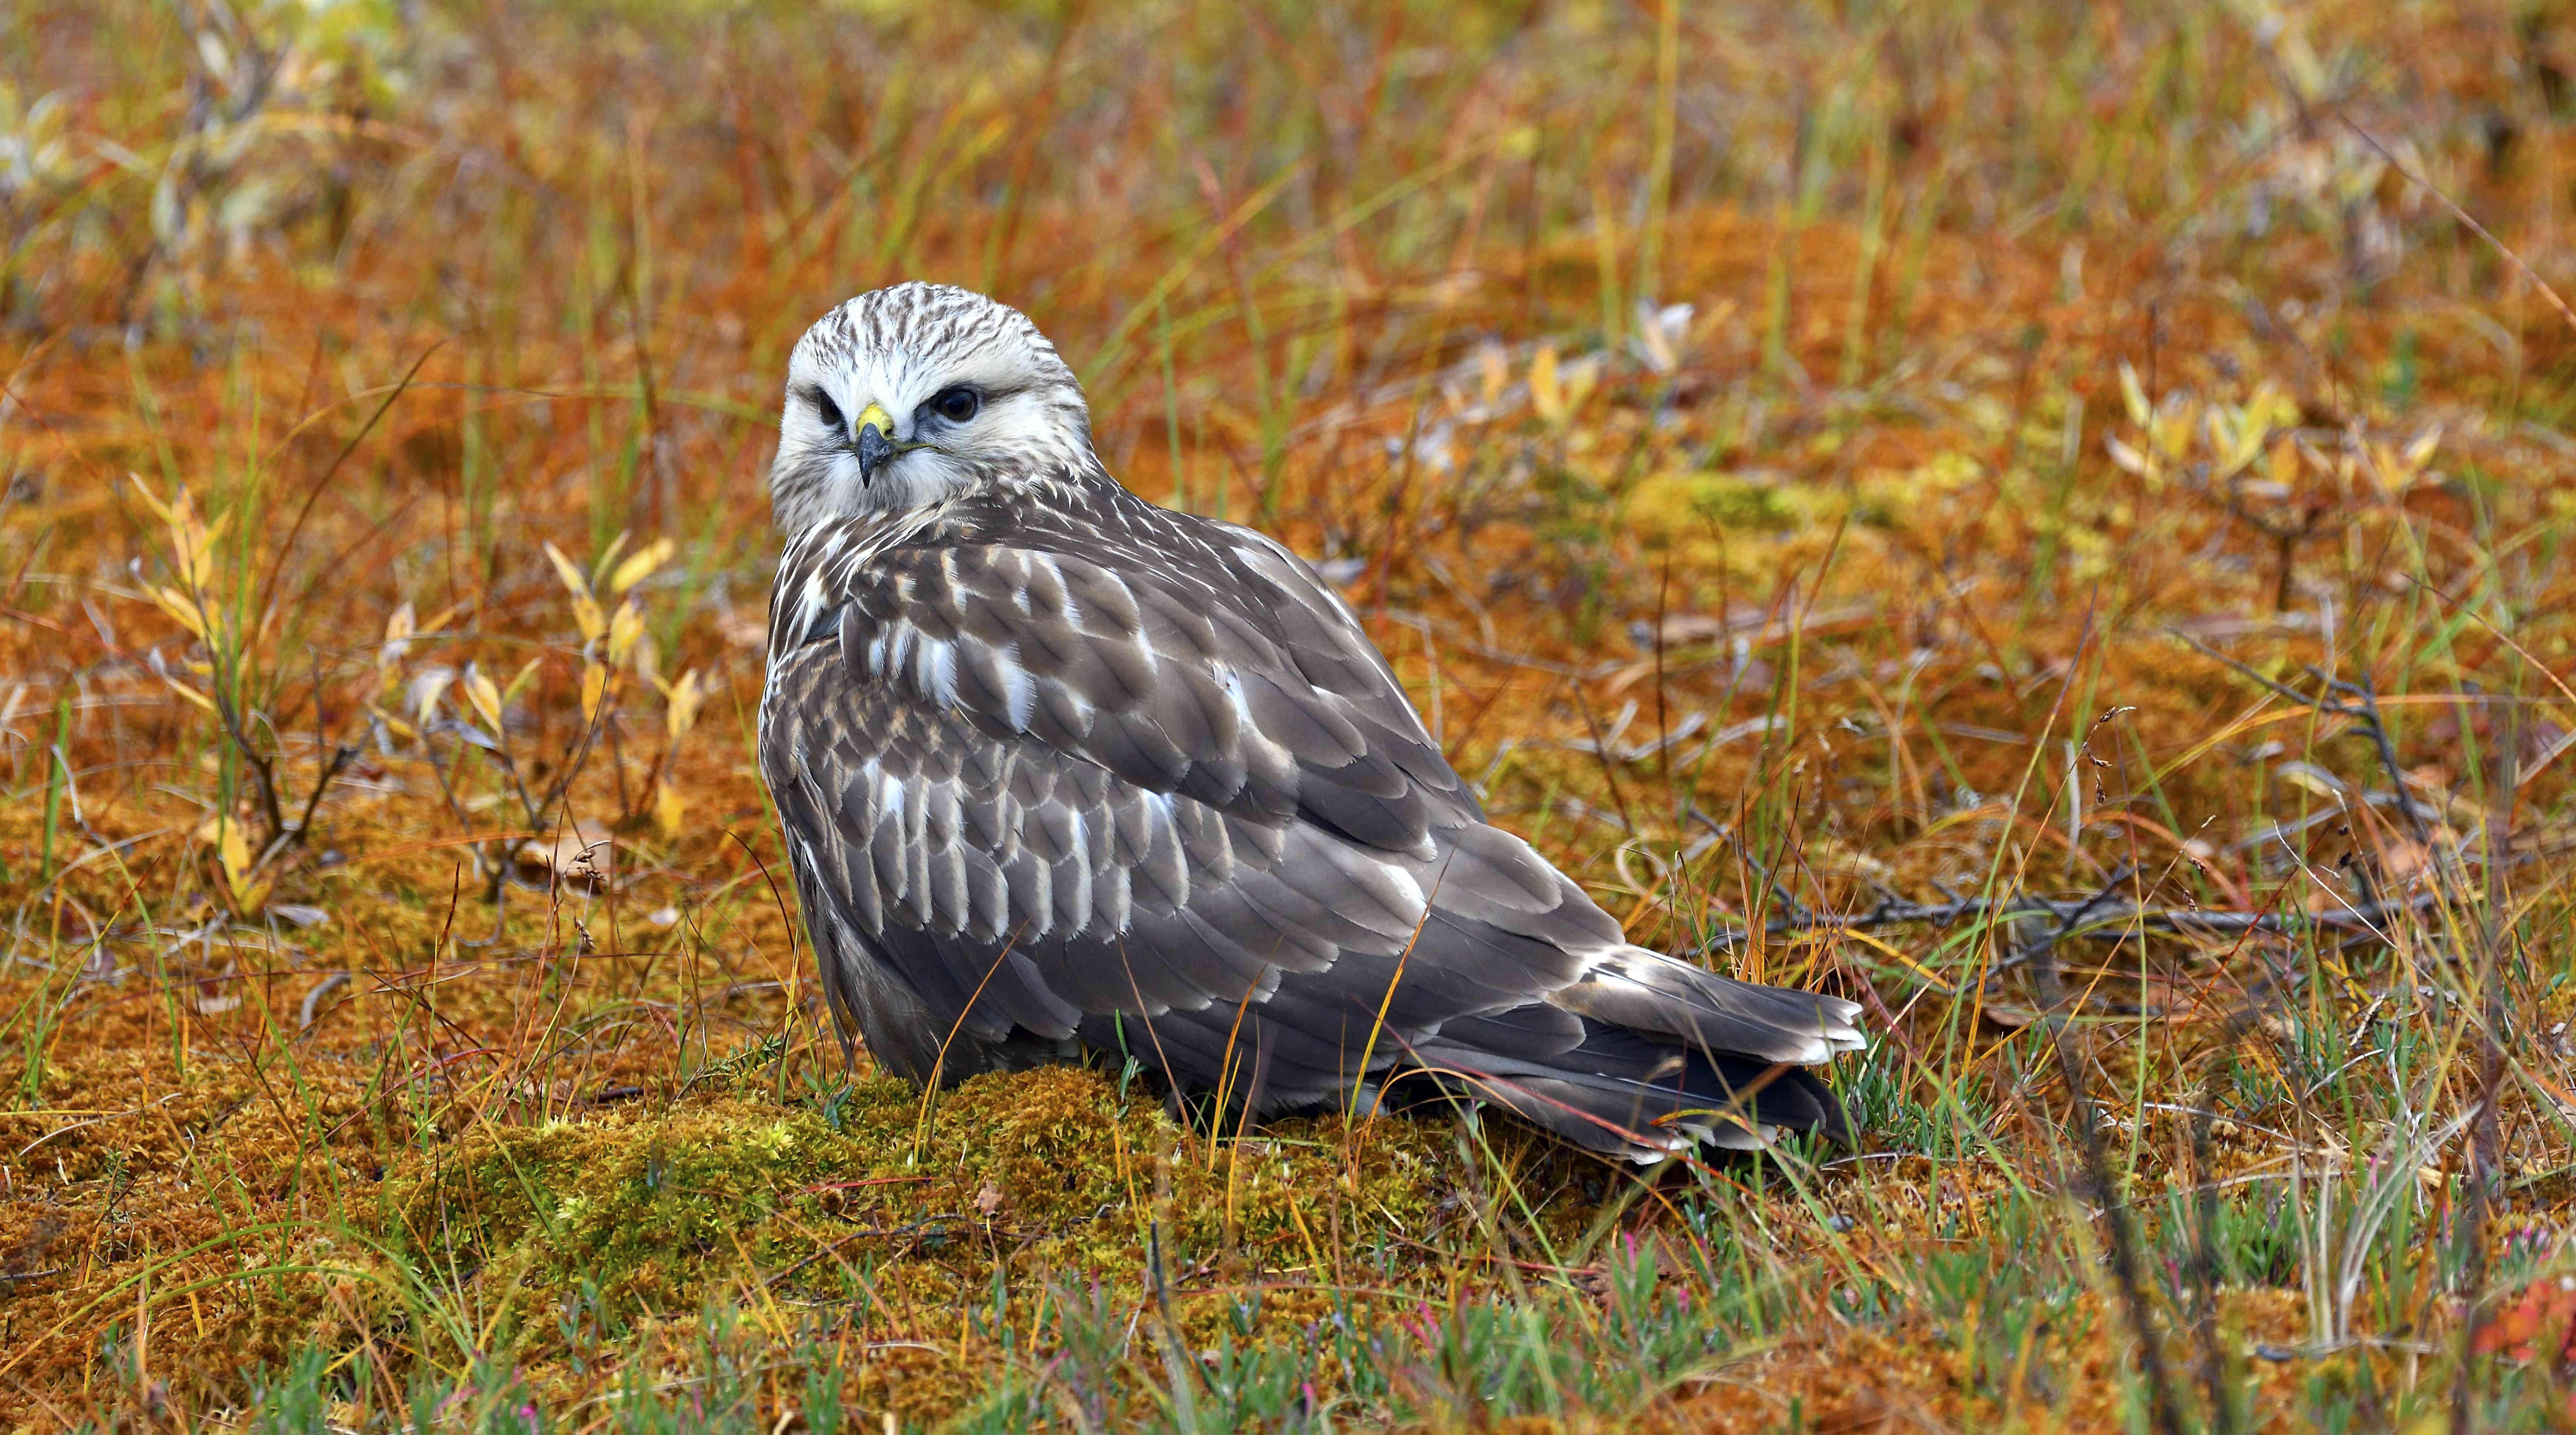 Rough-legged buzzard or hawk (Buteo lagopus), sitting, autumn coloured tundra, Northern Norway, Norway